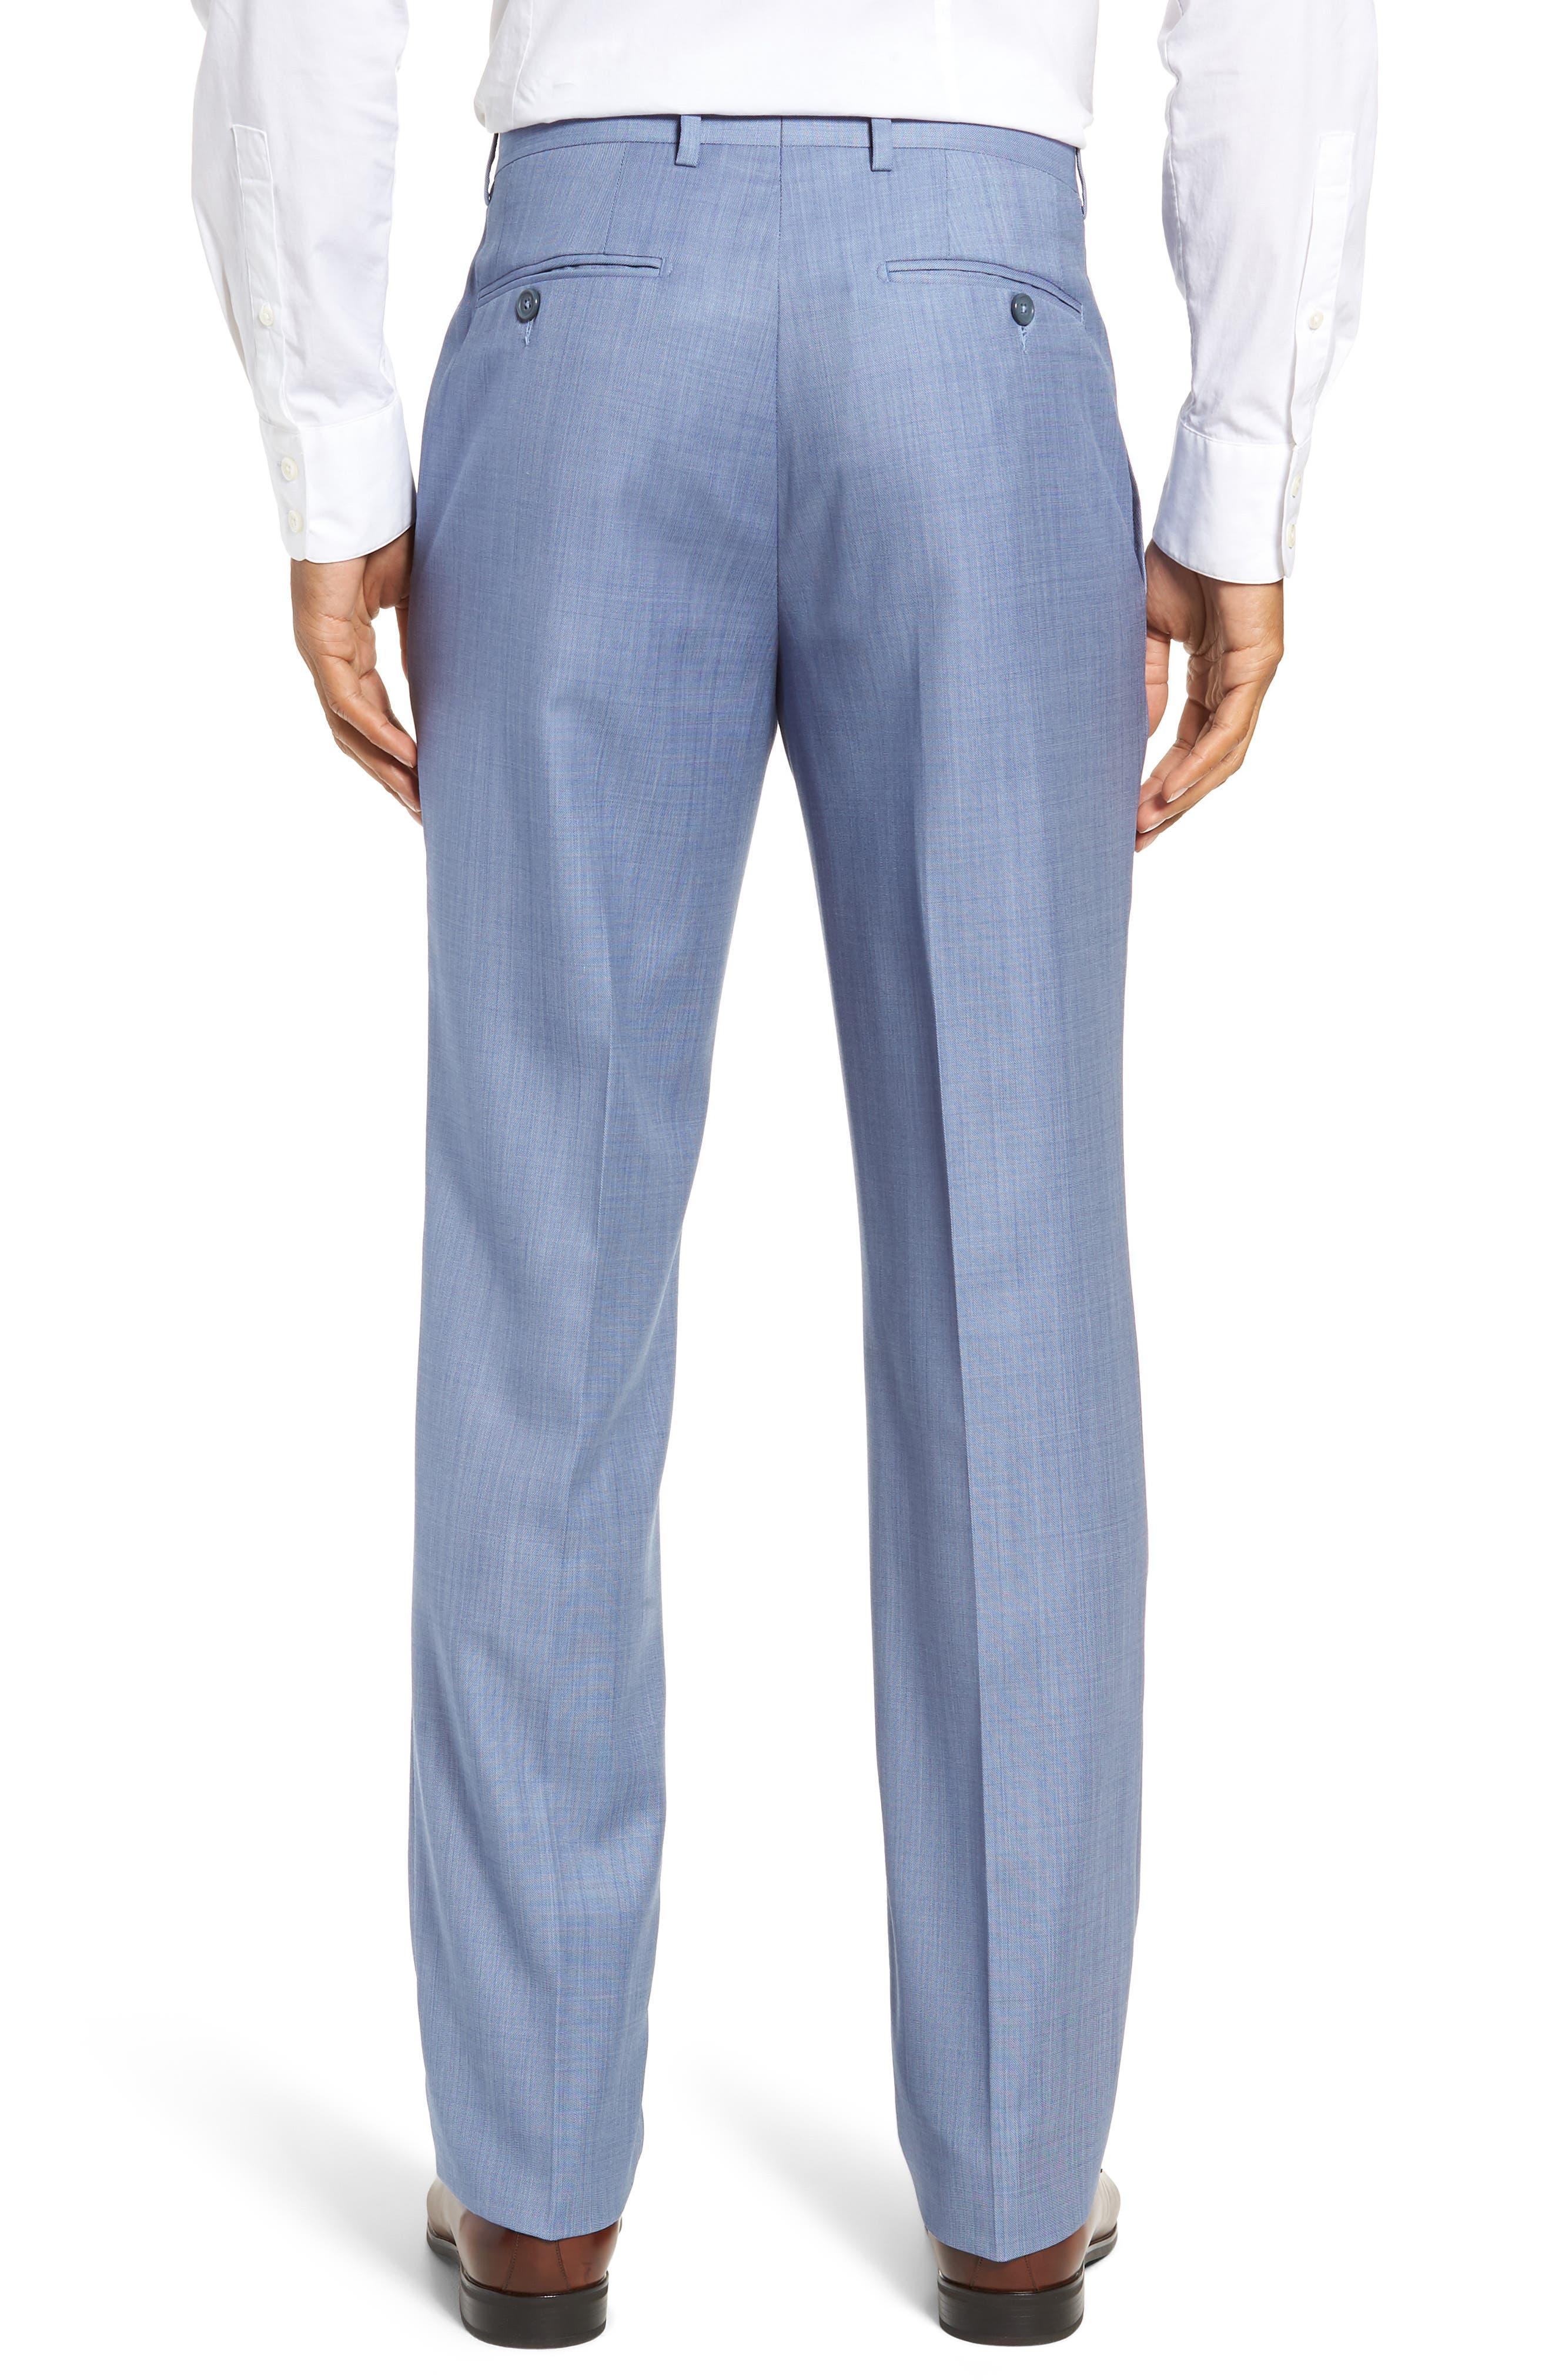 Flat Front Sharkskin Wool Trousers,                             Alternate thumbnail 2, color,                             LIGHT BLUE